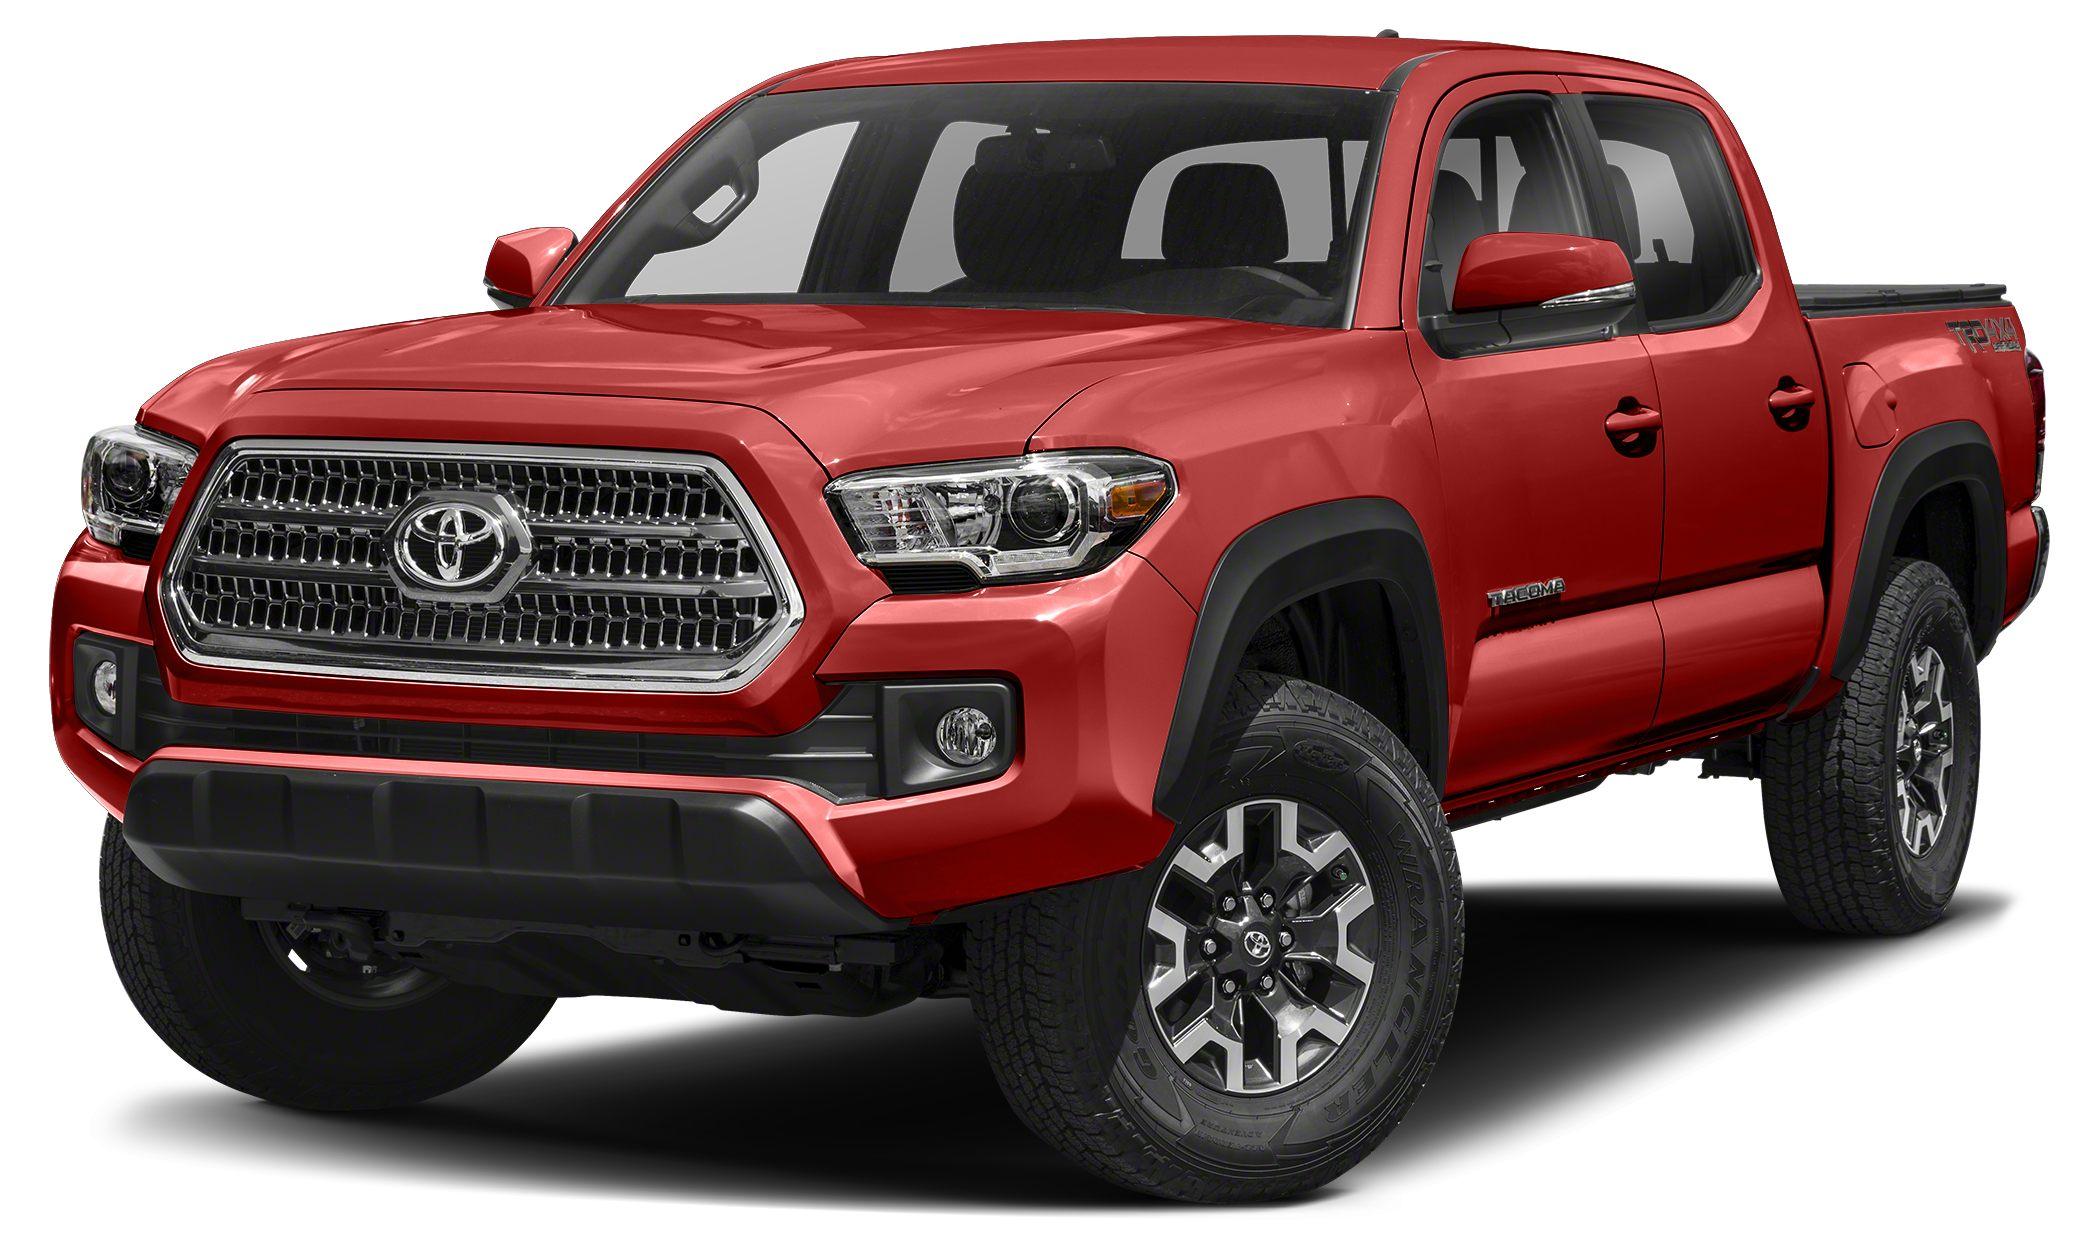 2017 Toyota Tacoma TRD Off Road Heated Seats Moonroof Nav System Back-Up Camera Keyless Start